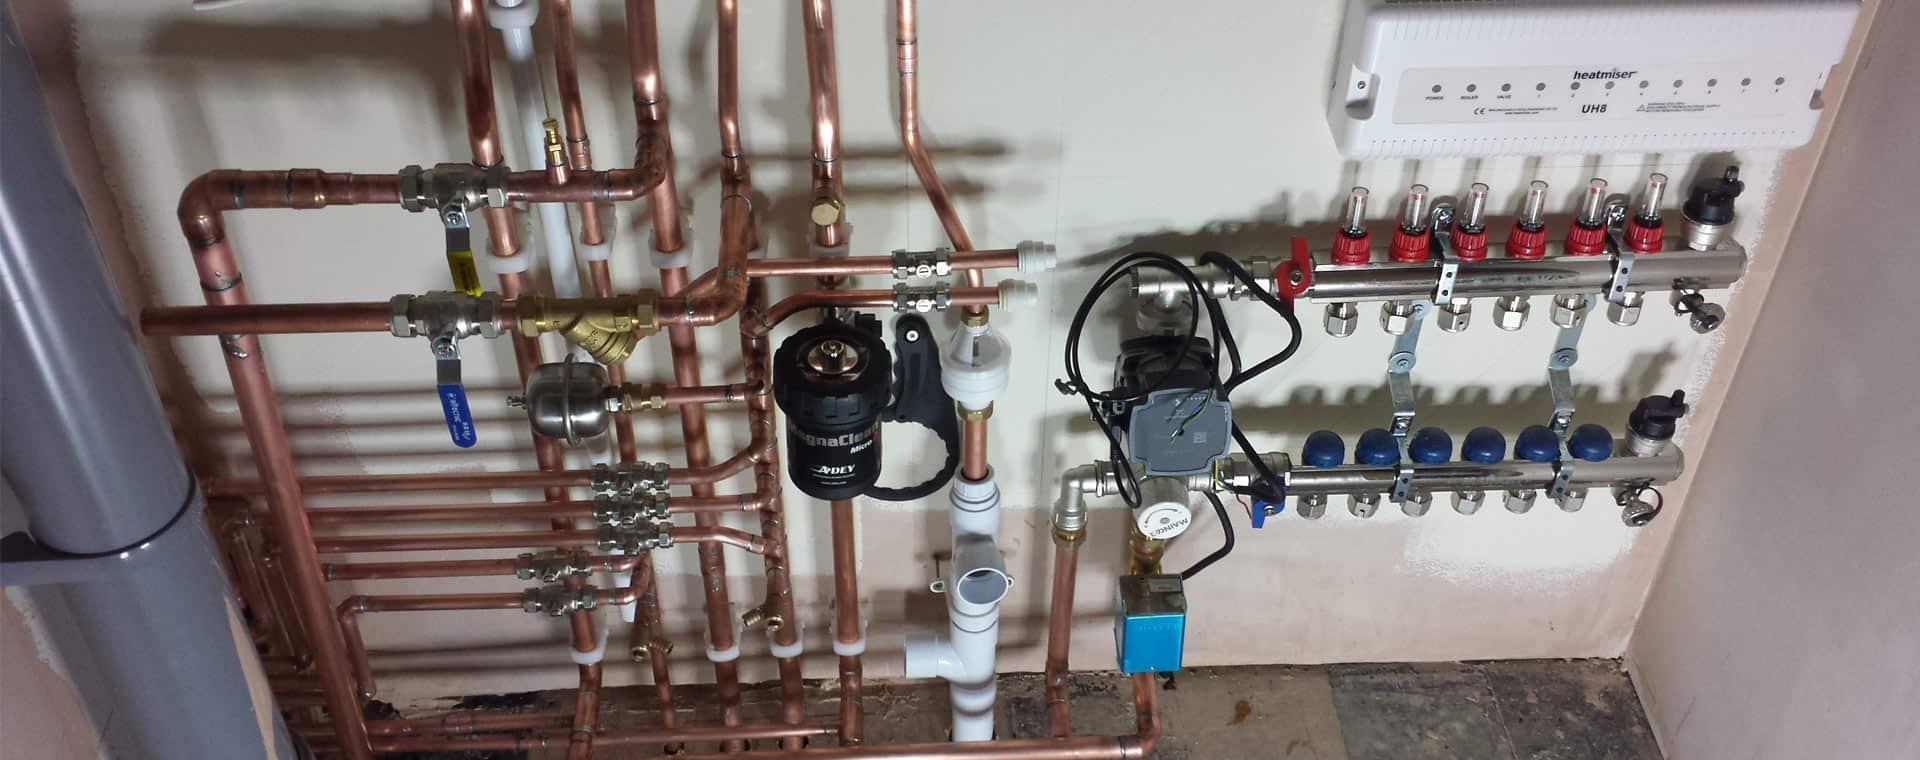 Reduce Heating Bills